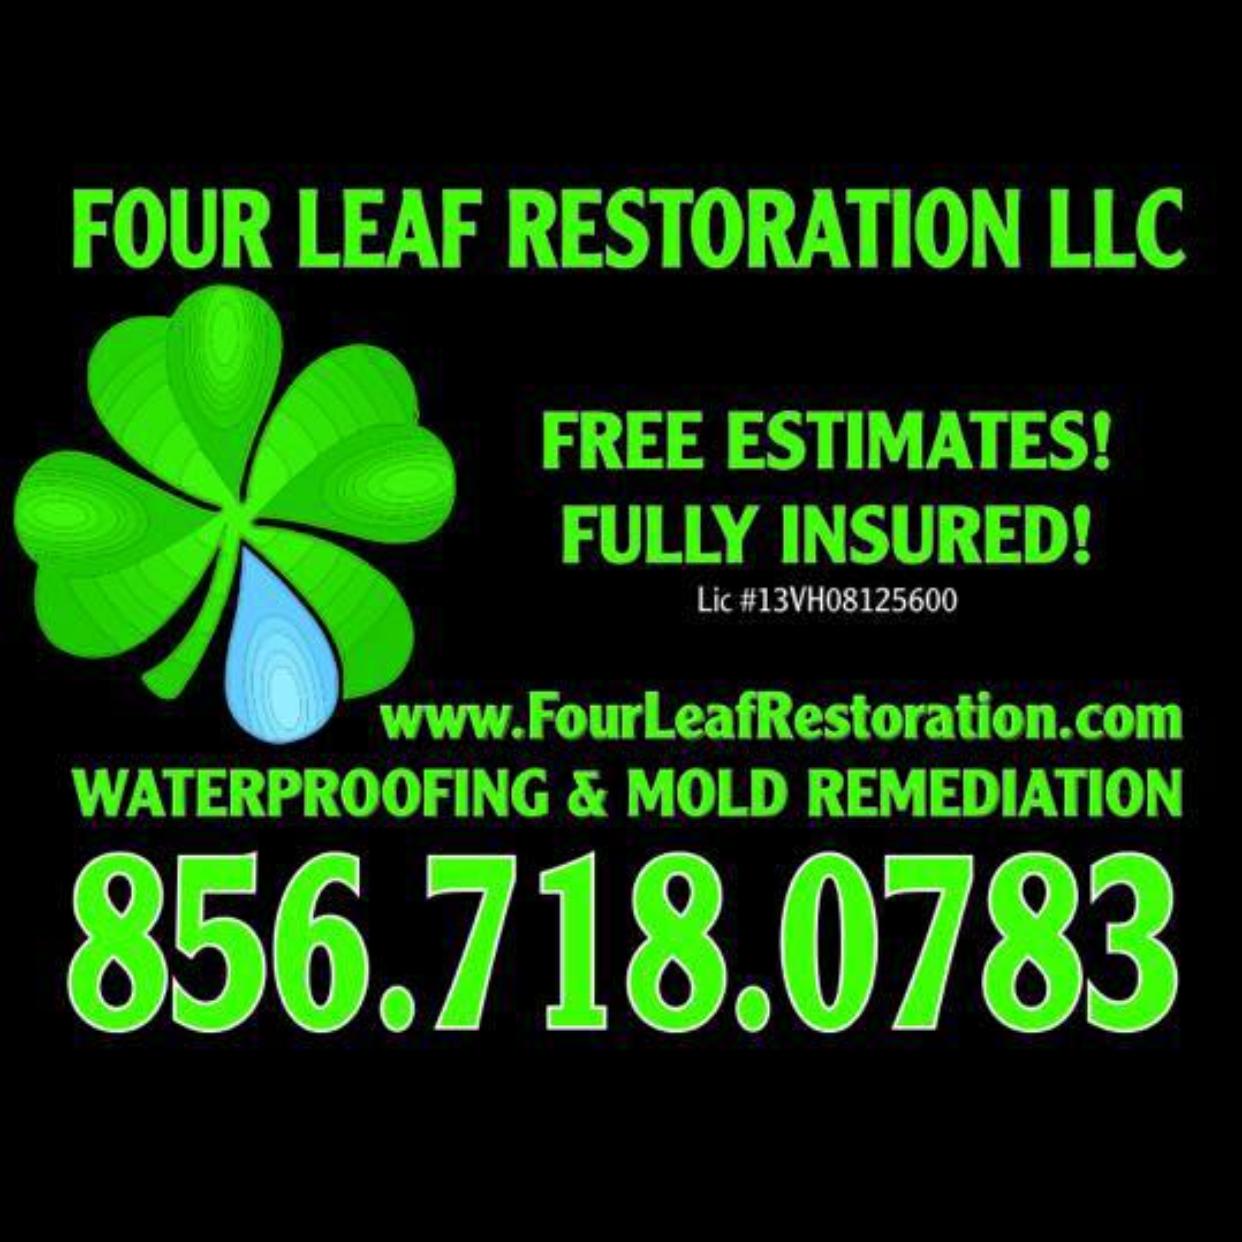 Four Leaf Restoration Basement/Crawlspace Waterproofing & Mold Remediation